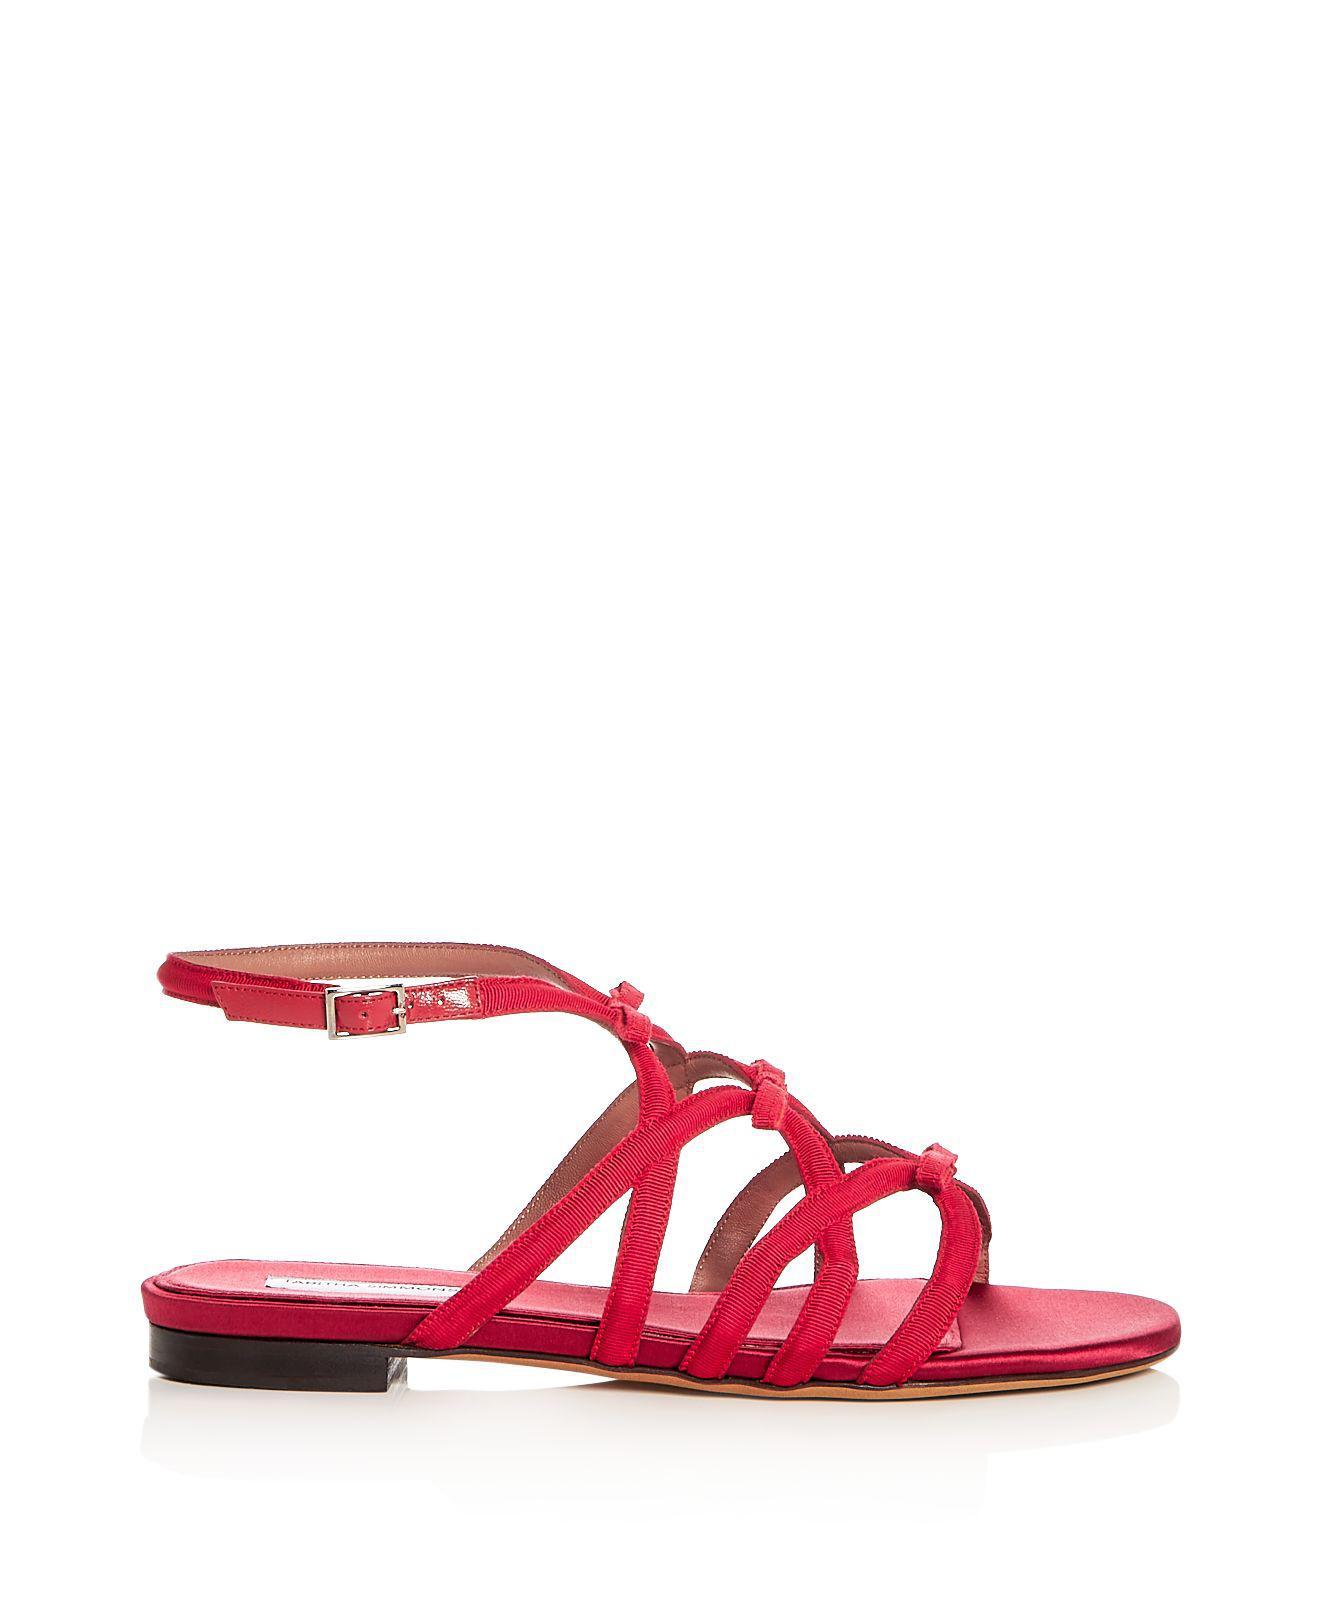 Tabitha Simmons Women's Minna Bow Sandals MFRfO